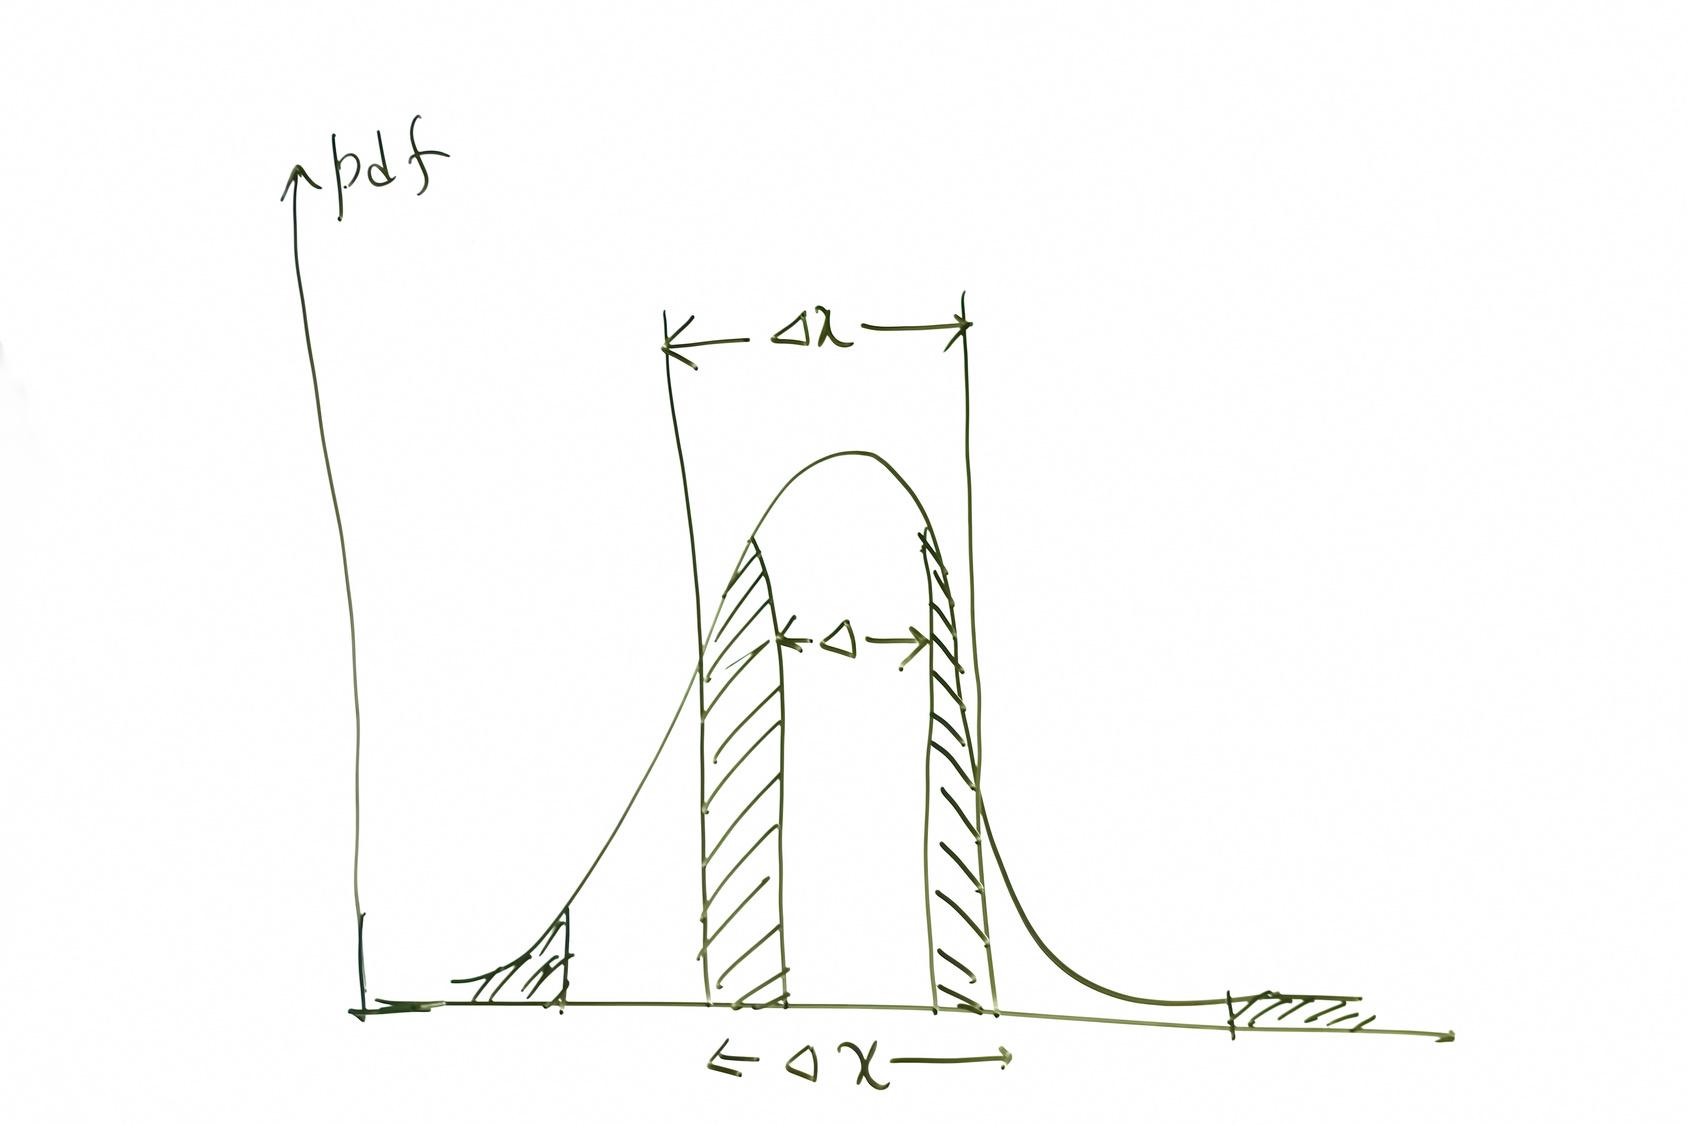 Gauss curve